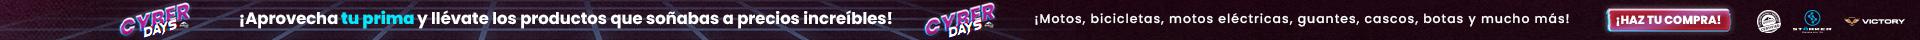 Cyber_Days